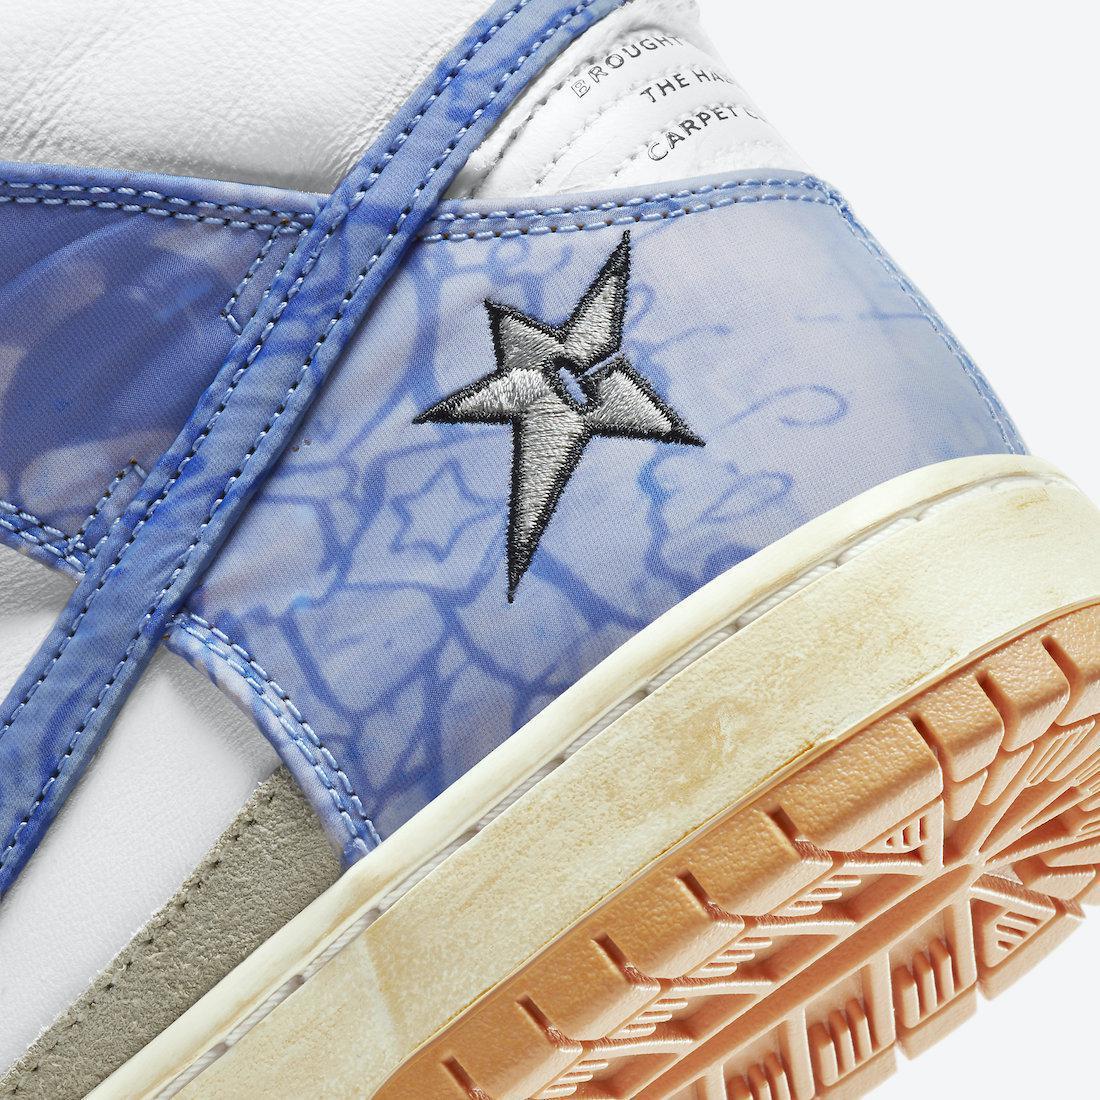 Official Photos - Carpet Company x Nike SB Dunk High